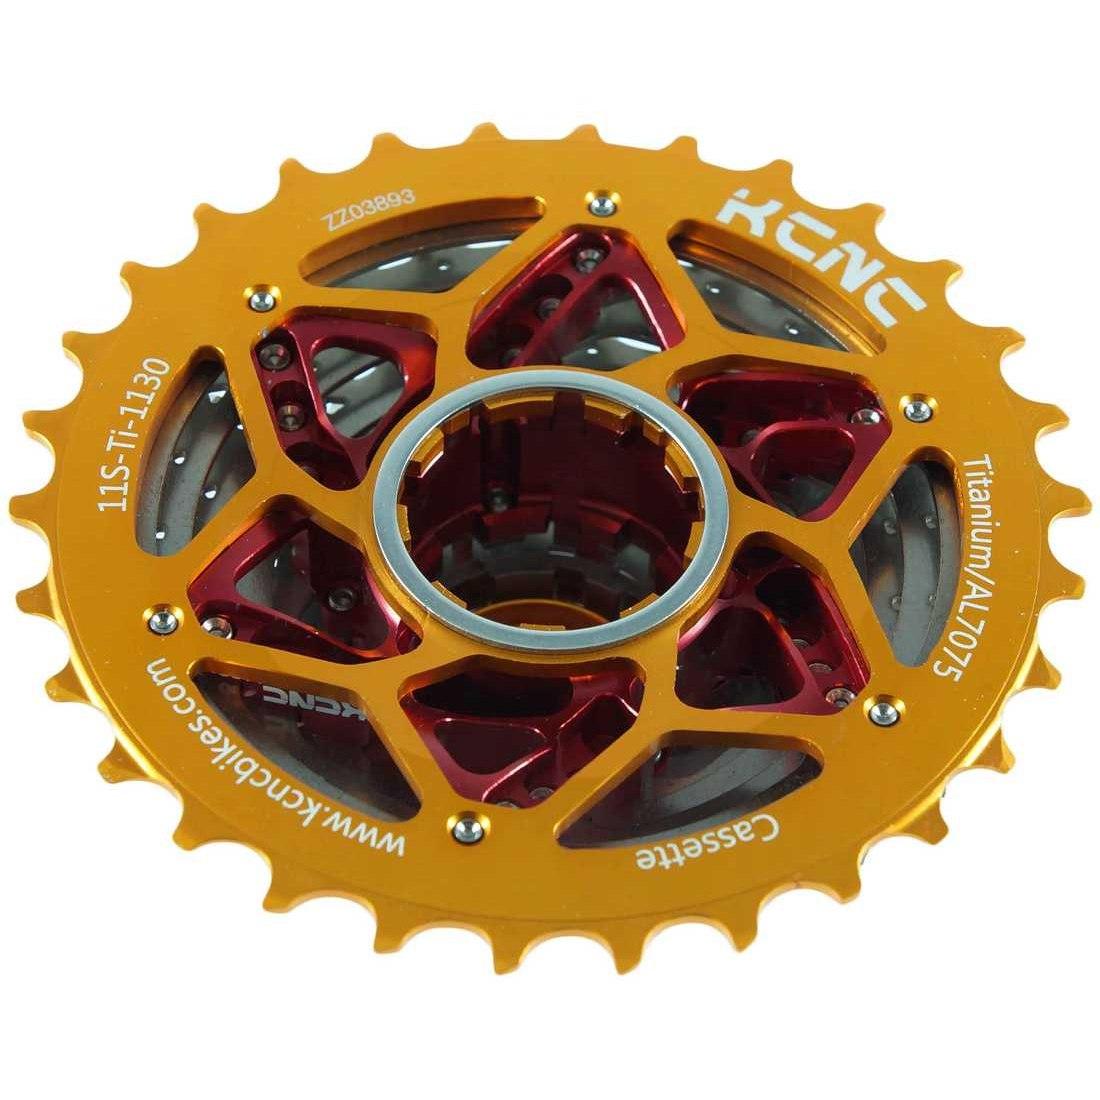 Image of KCNC Road Bike Titanium Cassette 11-30T for Shimano/SRAM 11-speed